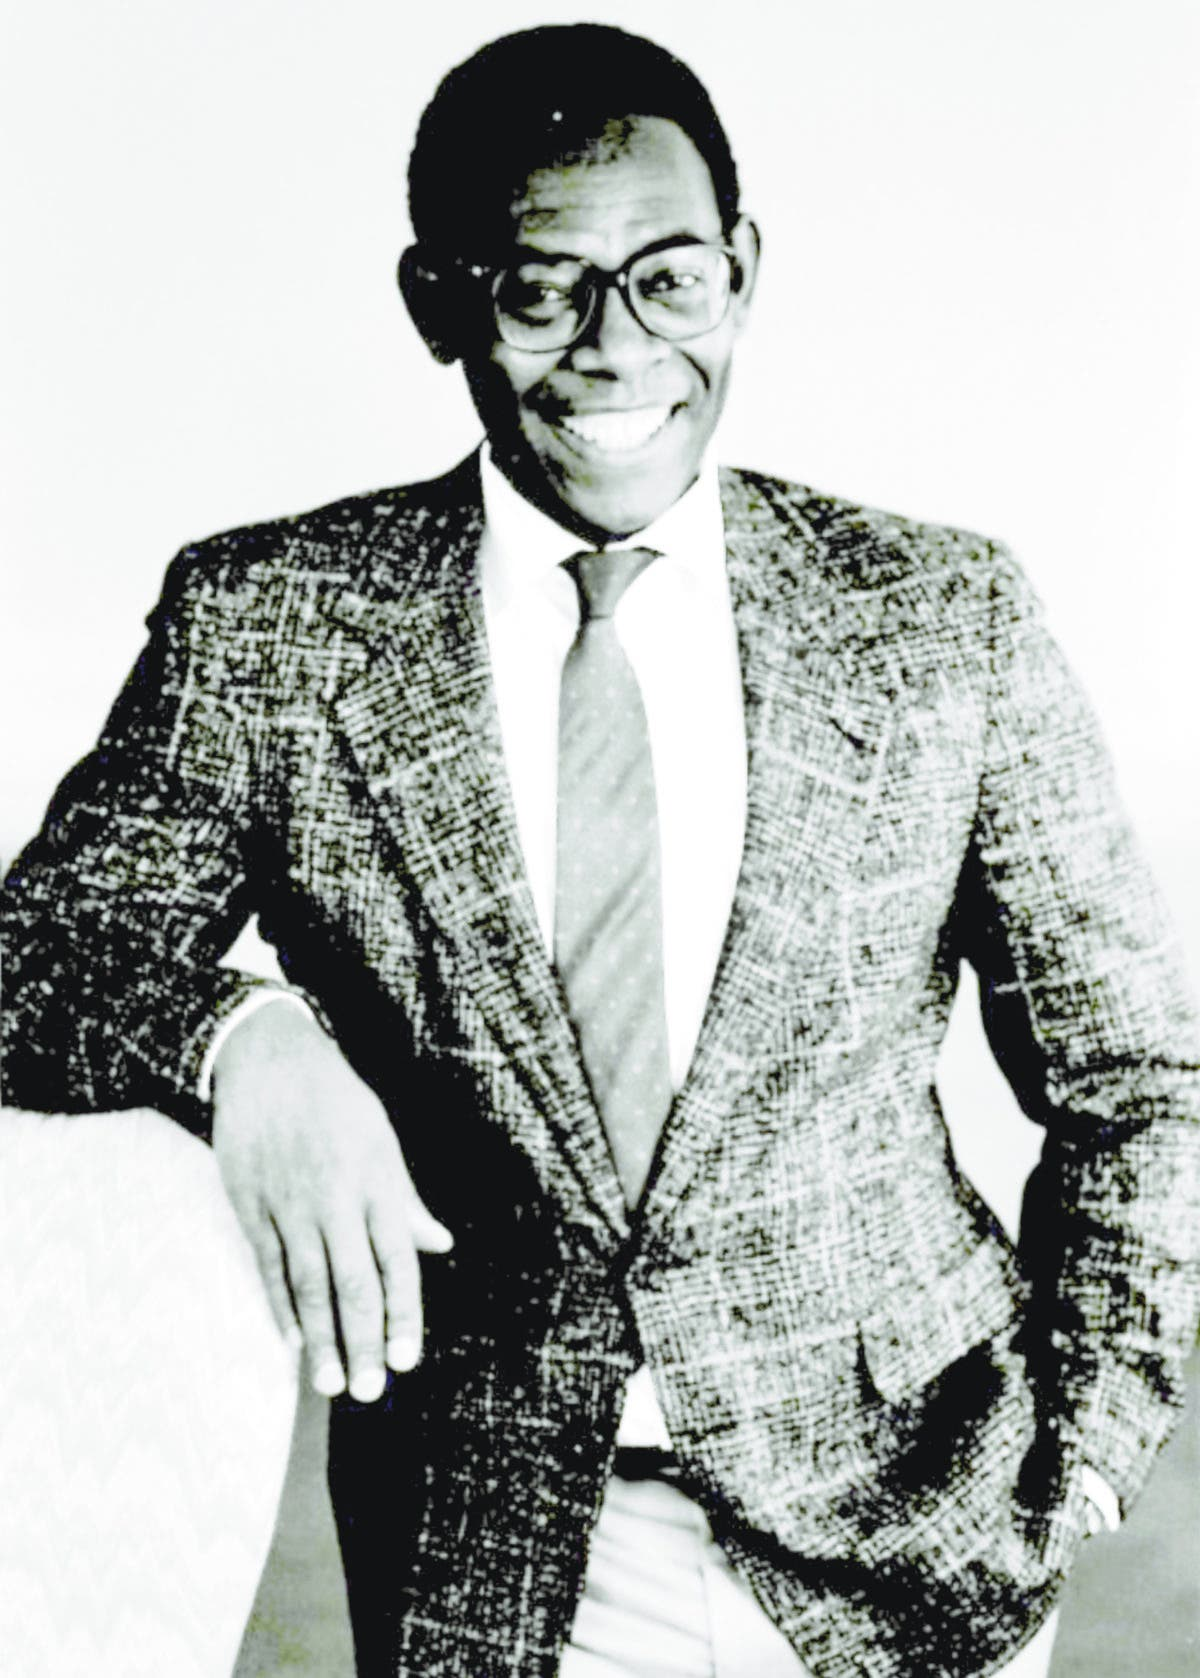 OBITUARIO NORBERTO JAMES RAWLINGS 1945-2021